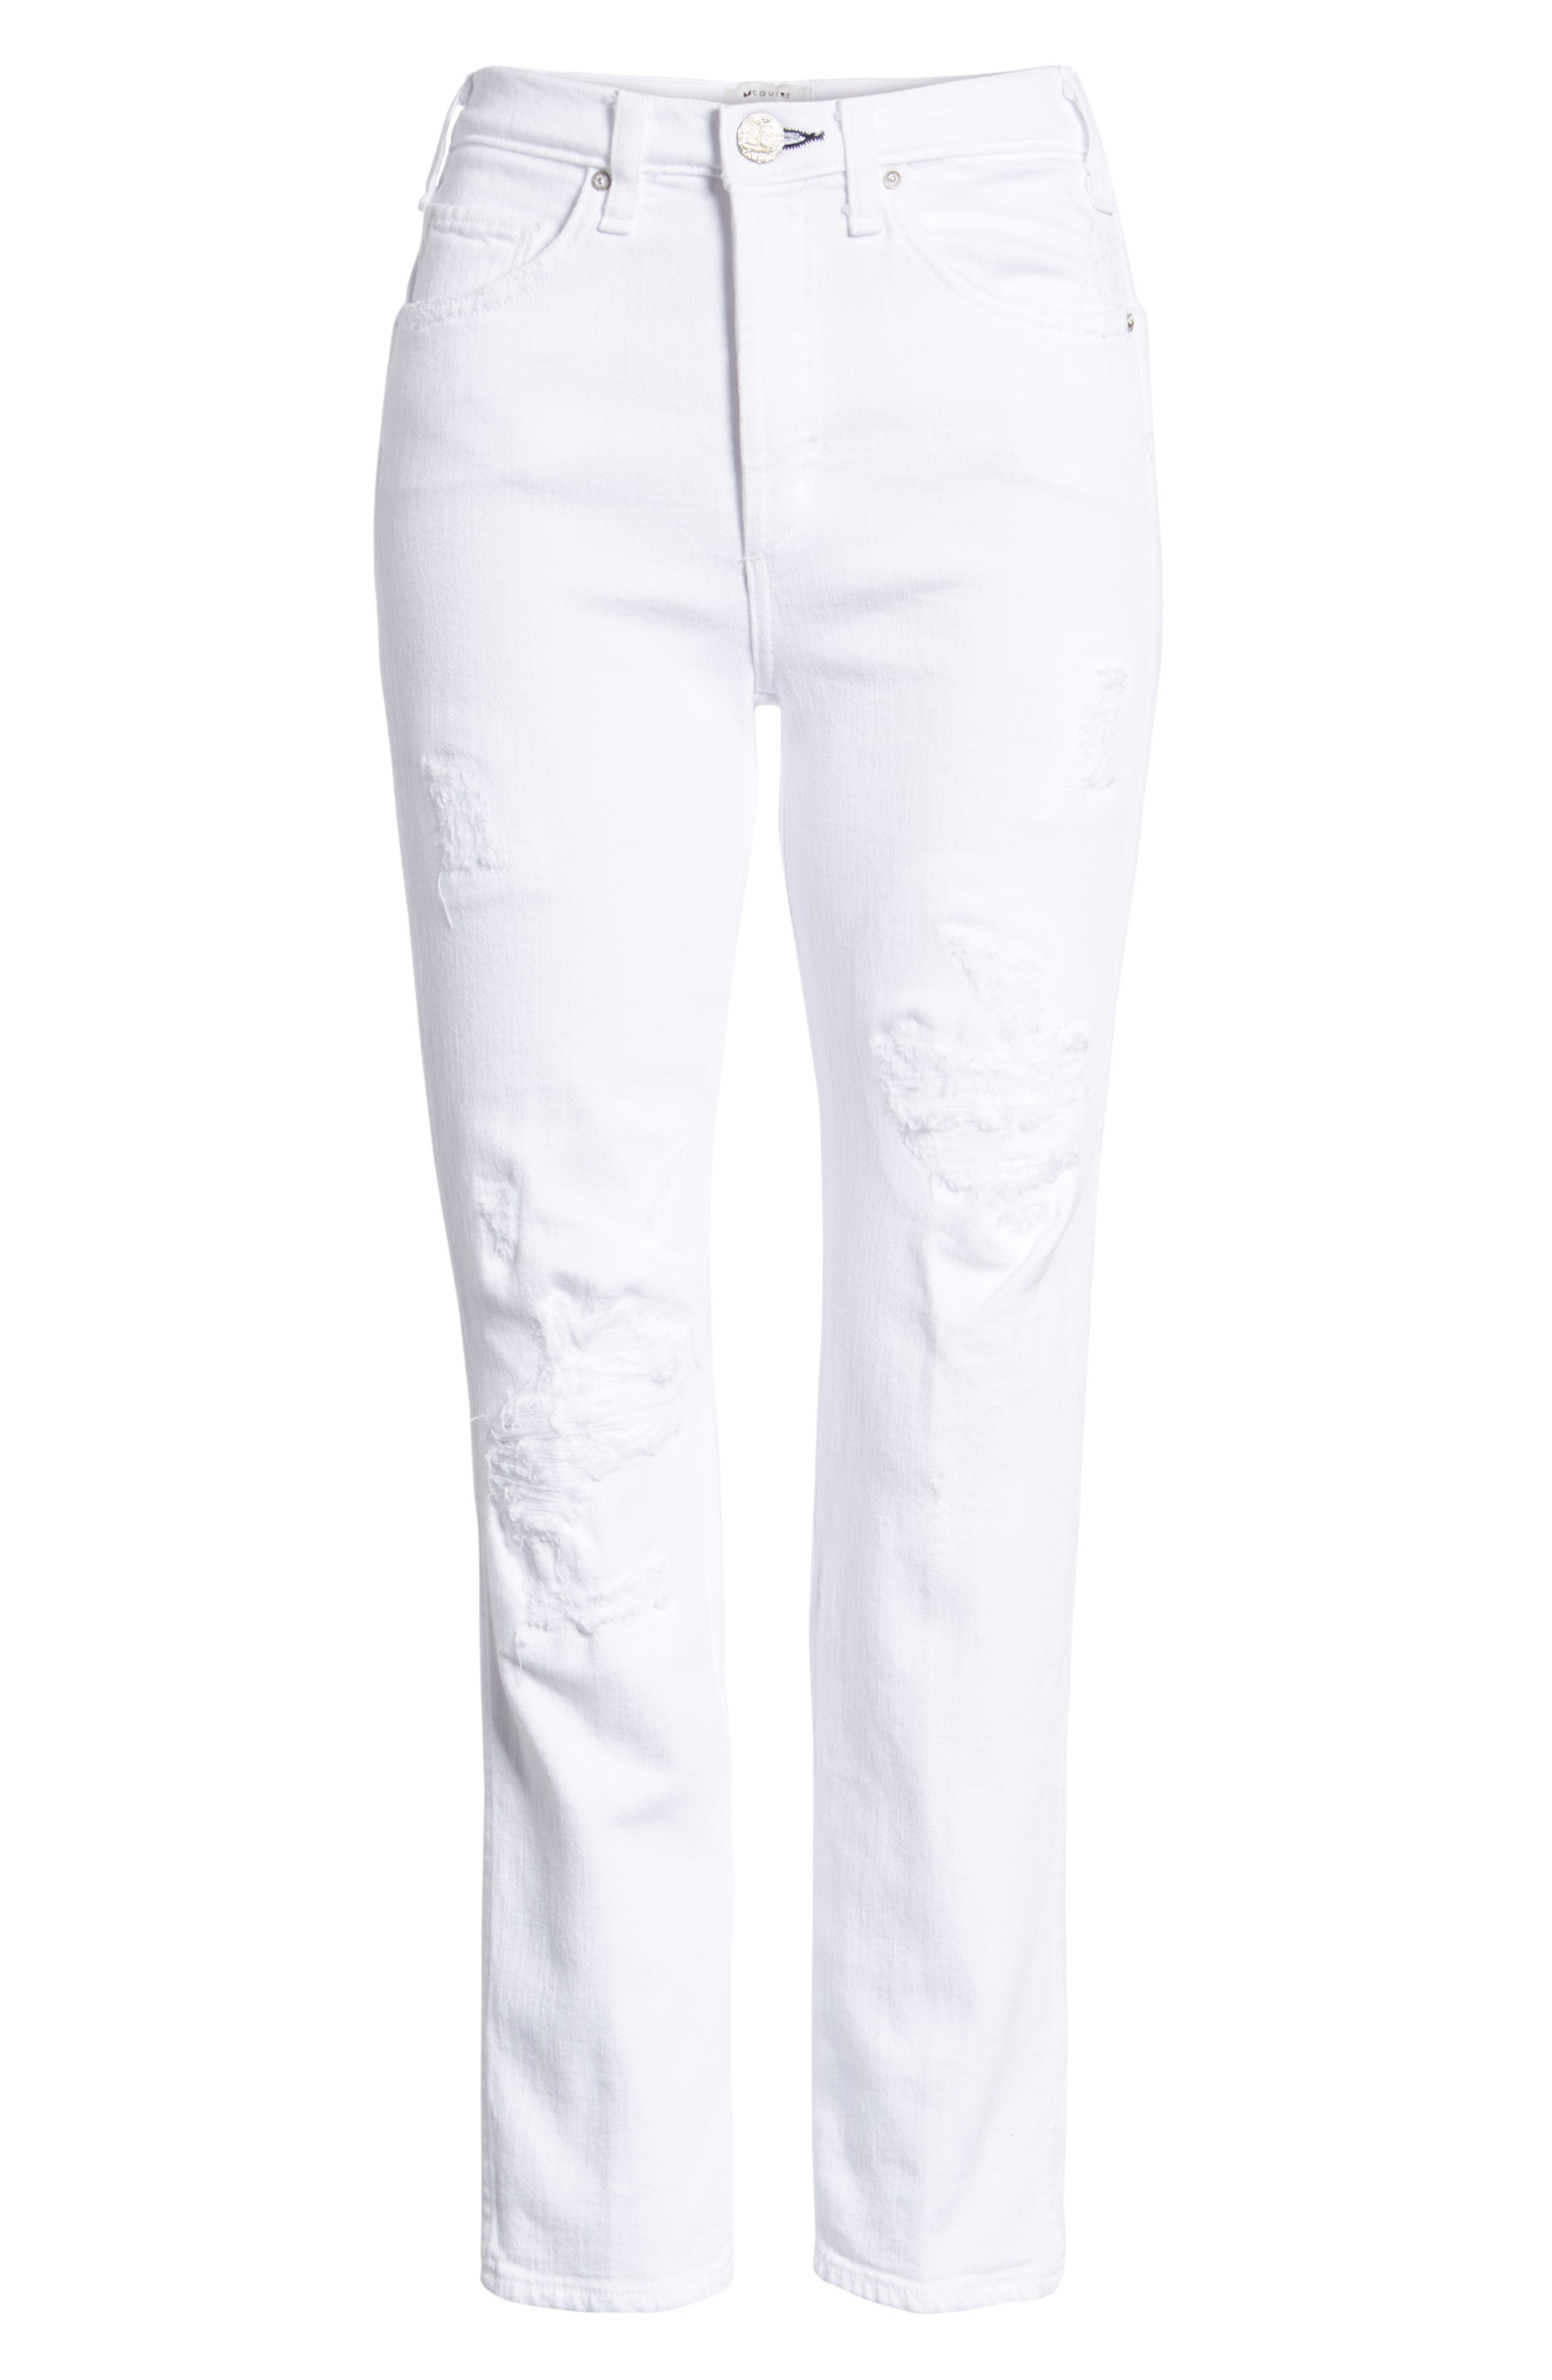 Kaia Distressed High Waist Slim Jeans,                             Alternate thumbnail 7, color,                             100